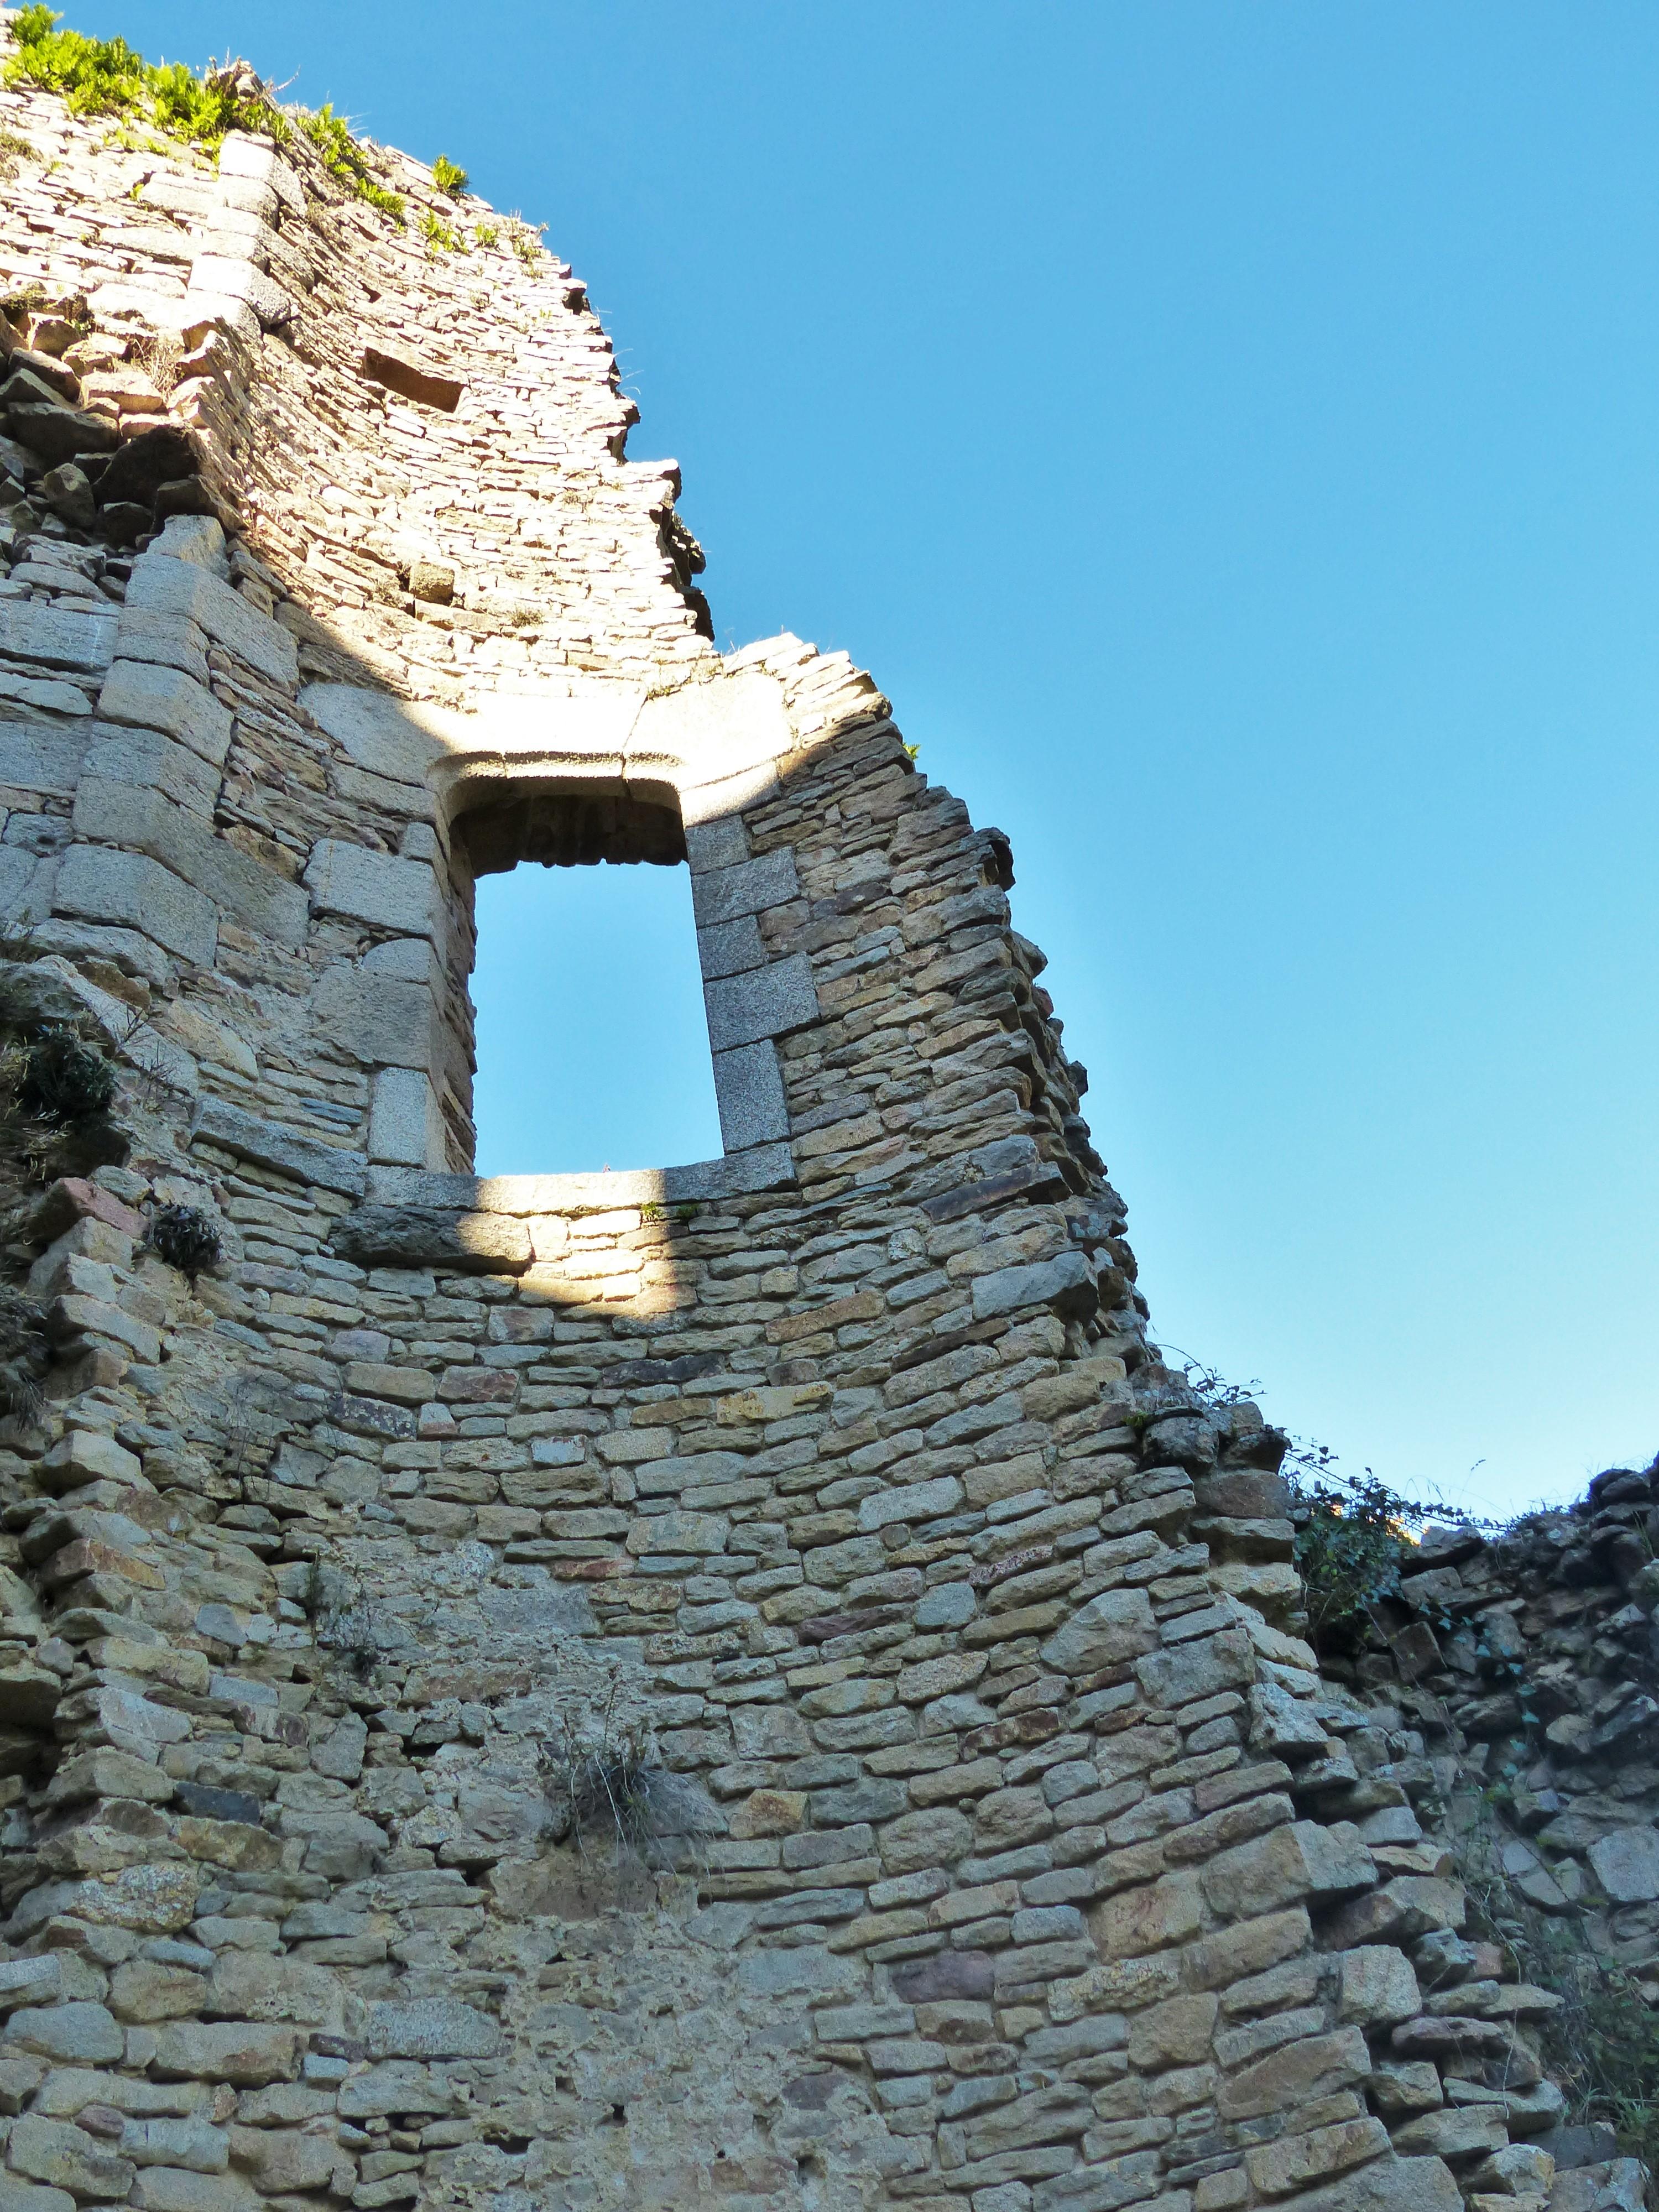 Chateau de Ranrouet